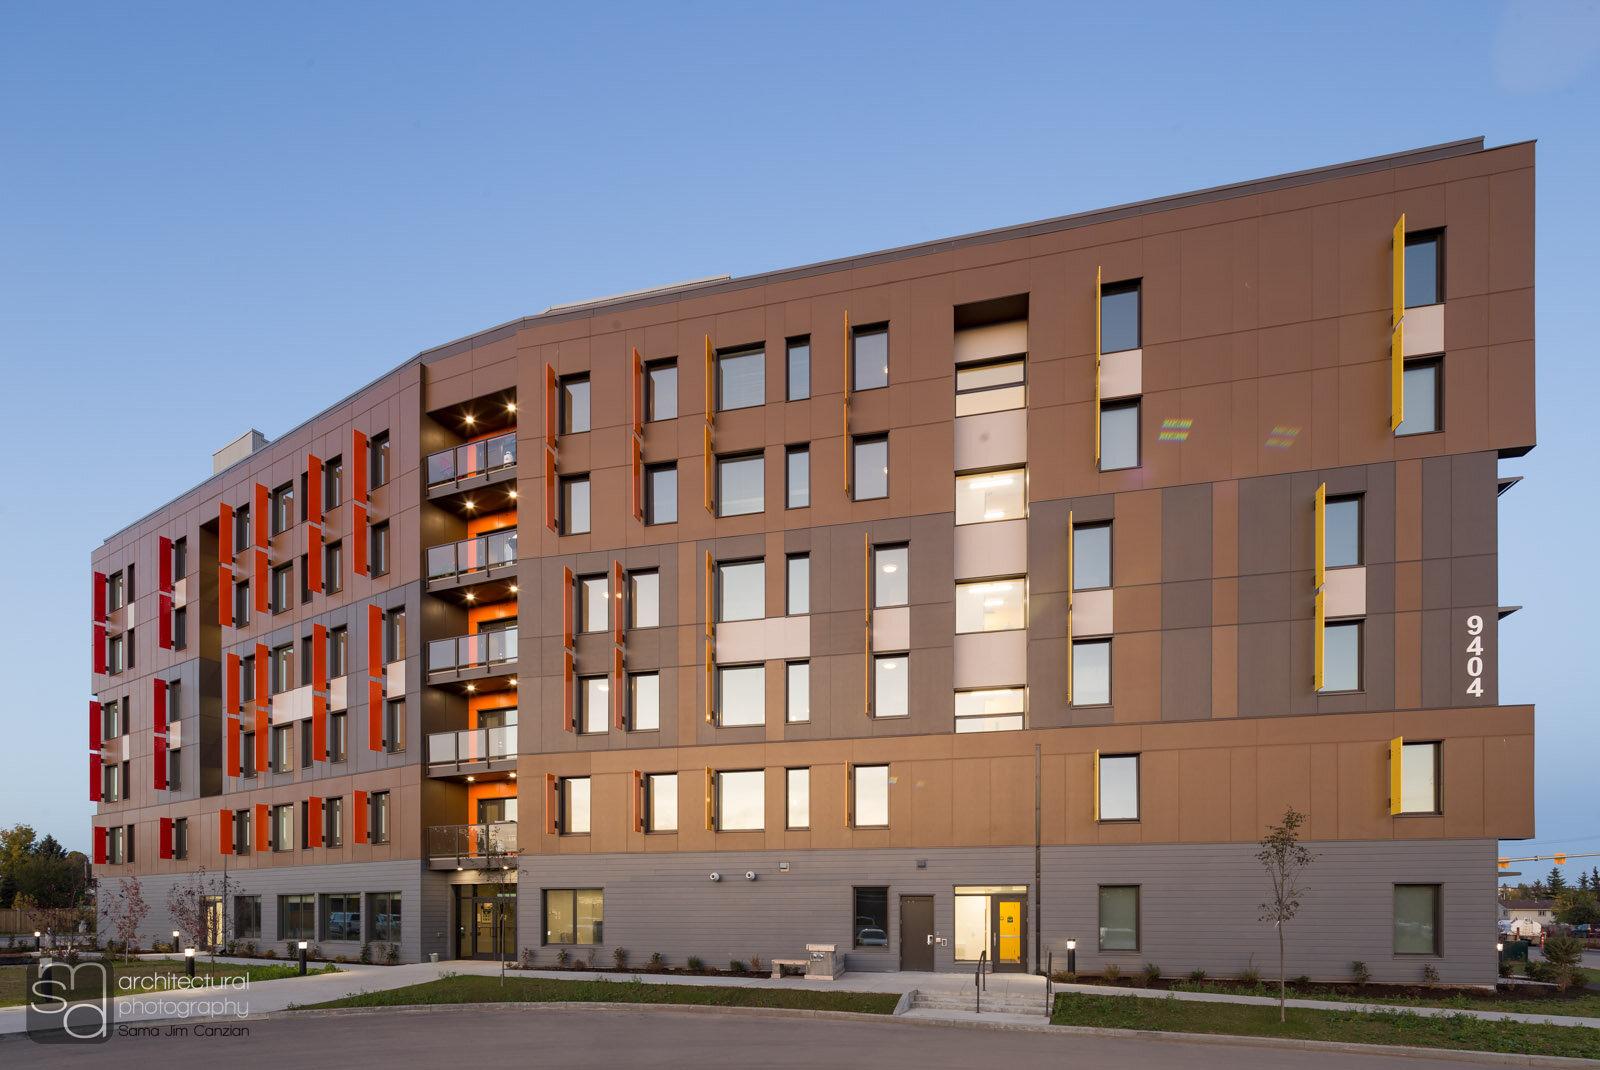 BC Housing 50-unit Passive House, Fort St. John, BC. Credit - WCPG